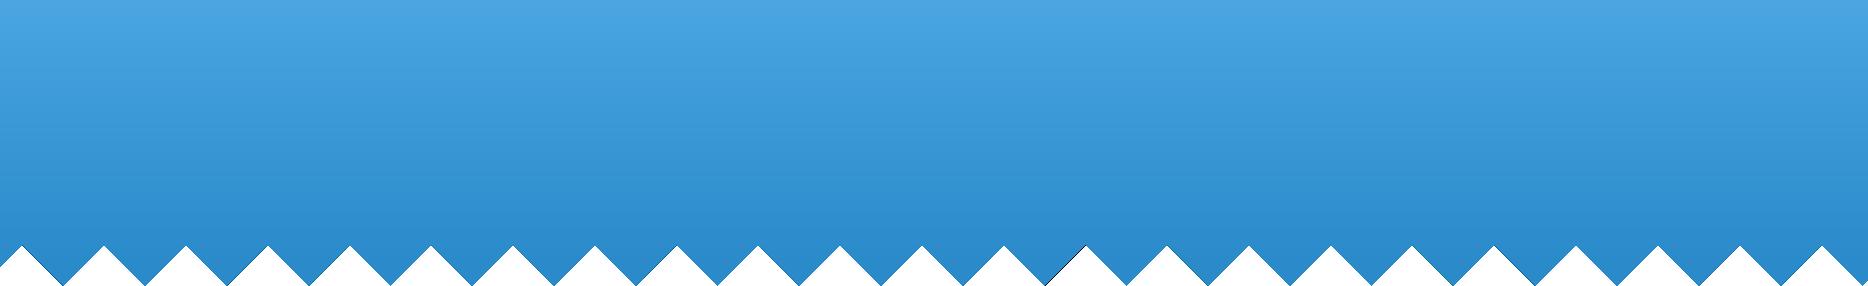 bg azul gradiente corte 2.png